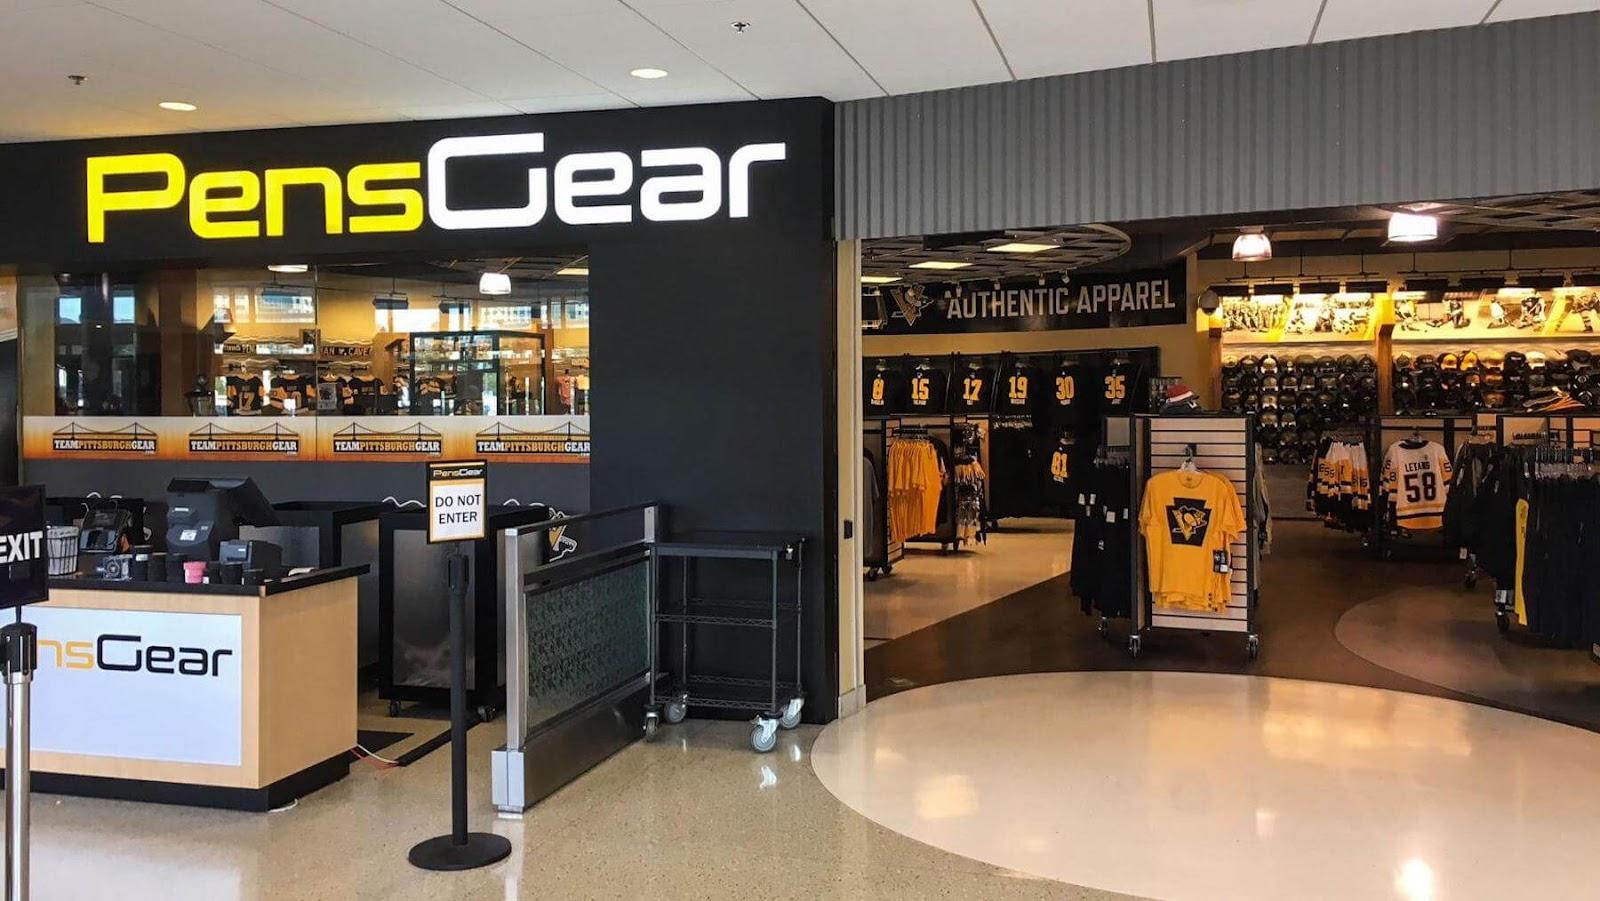 Pens Gear storefront